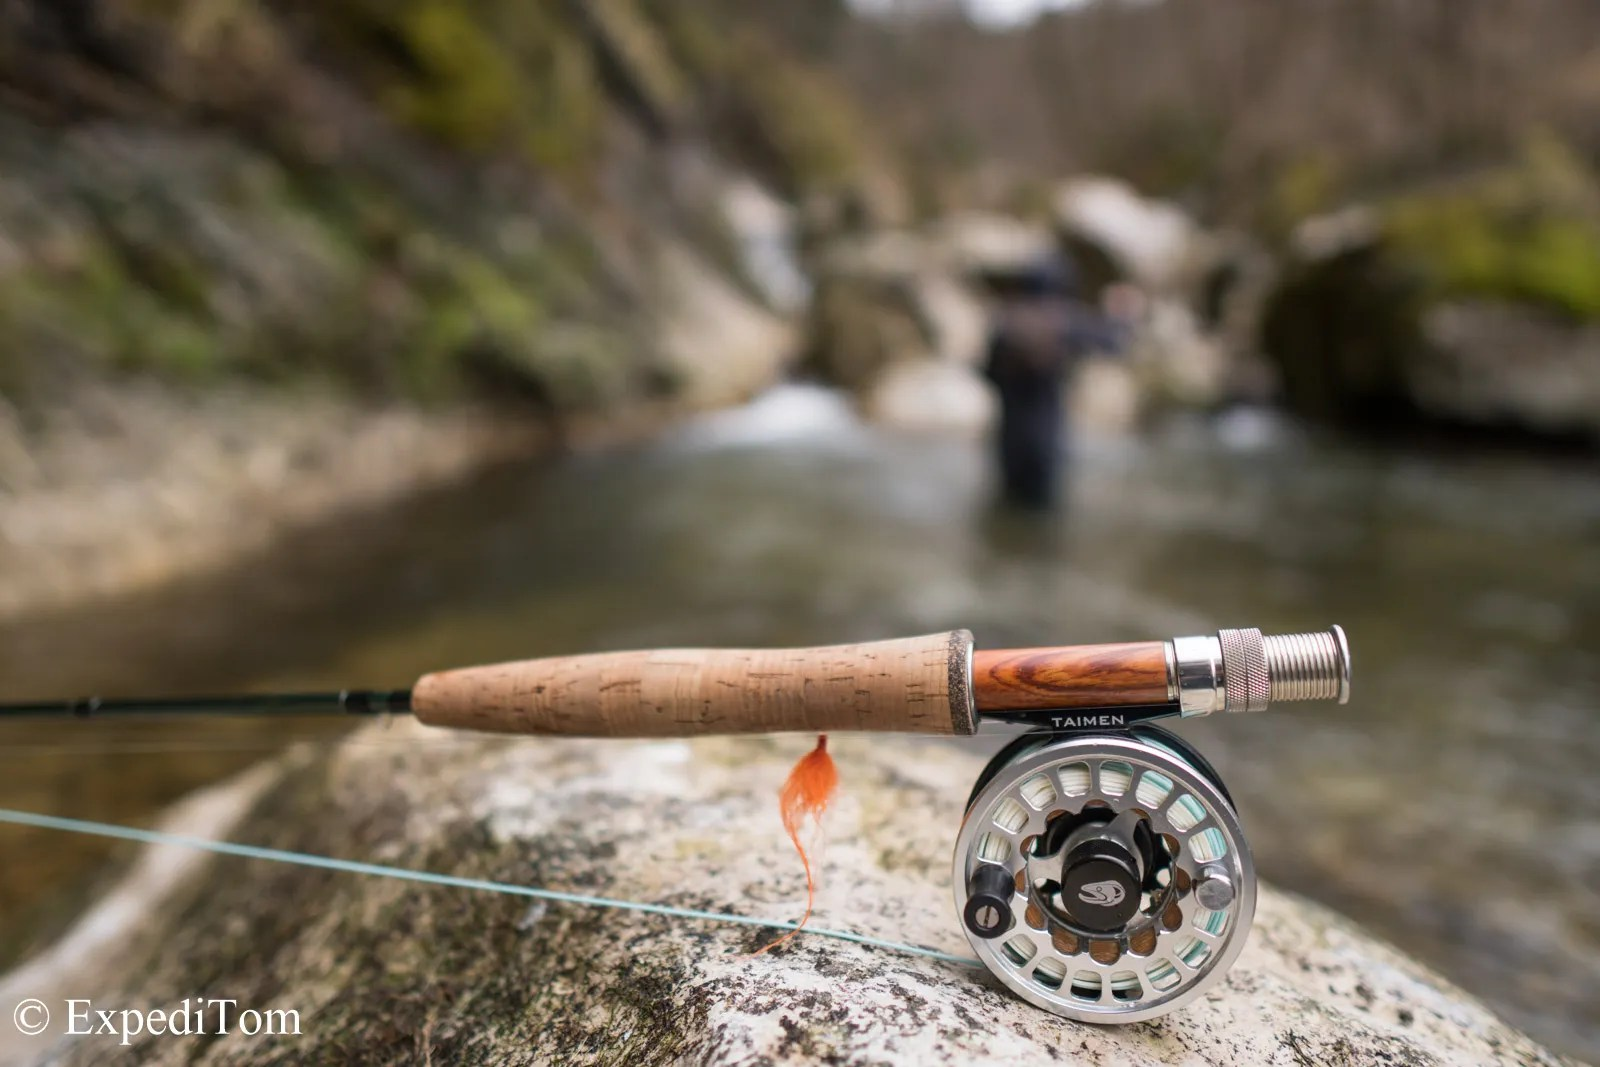 Fly Fishing Gear for Trout in Switzerland